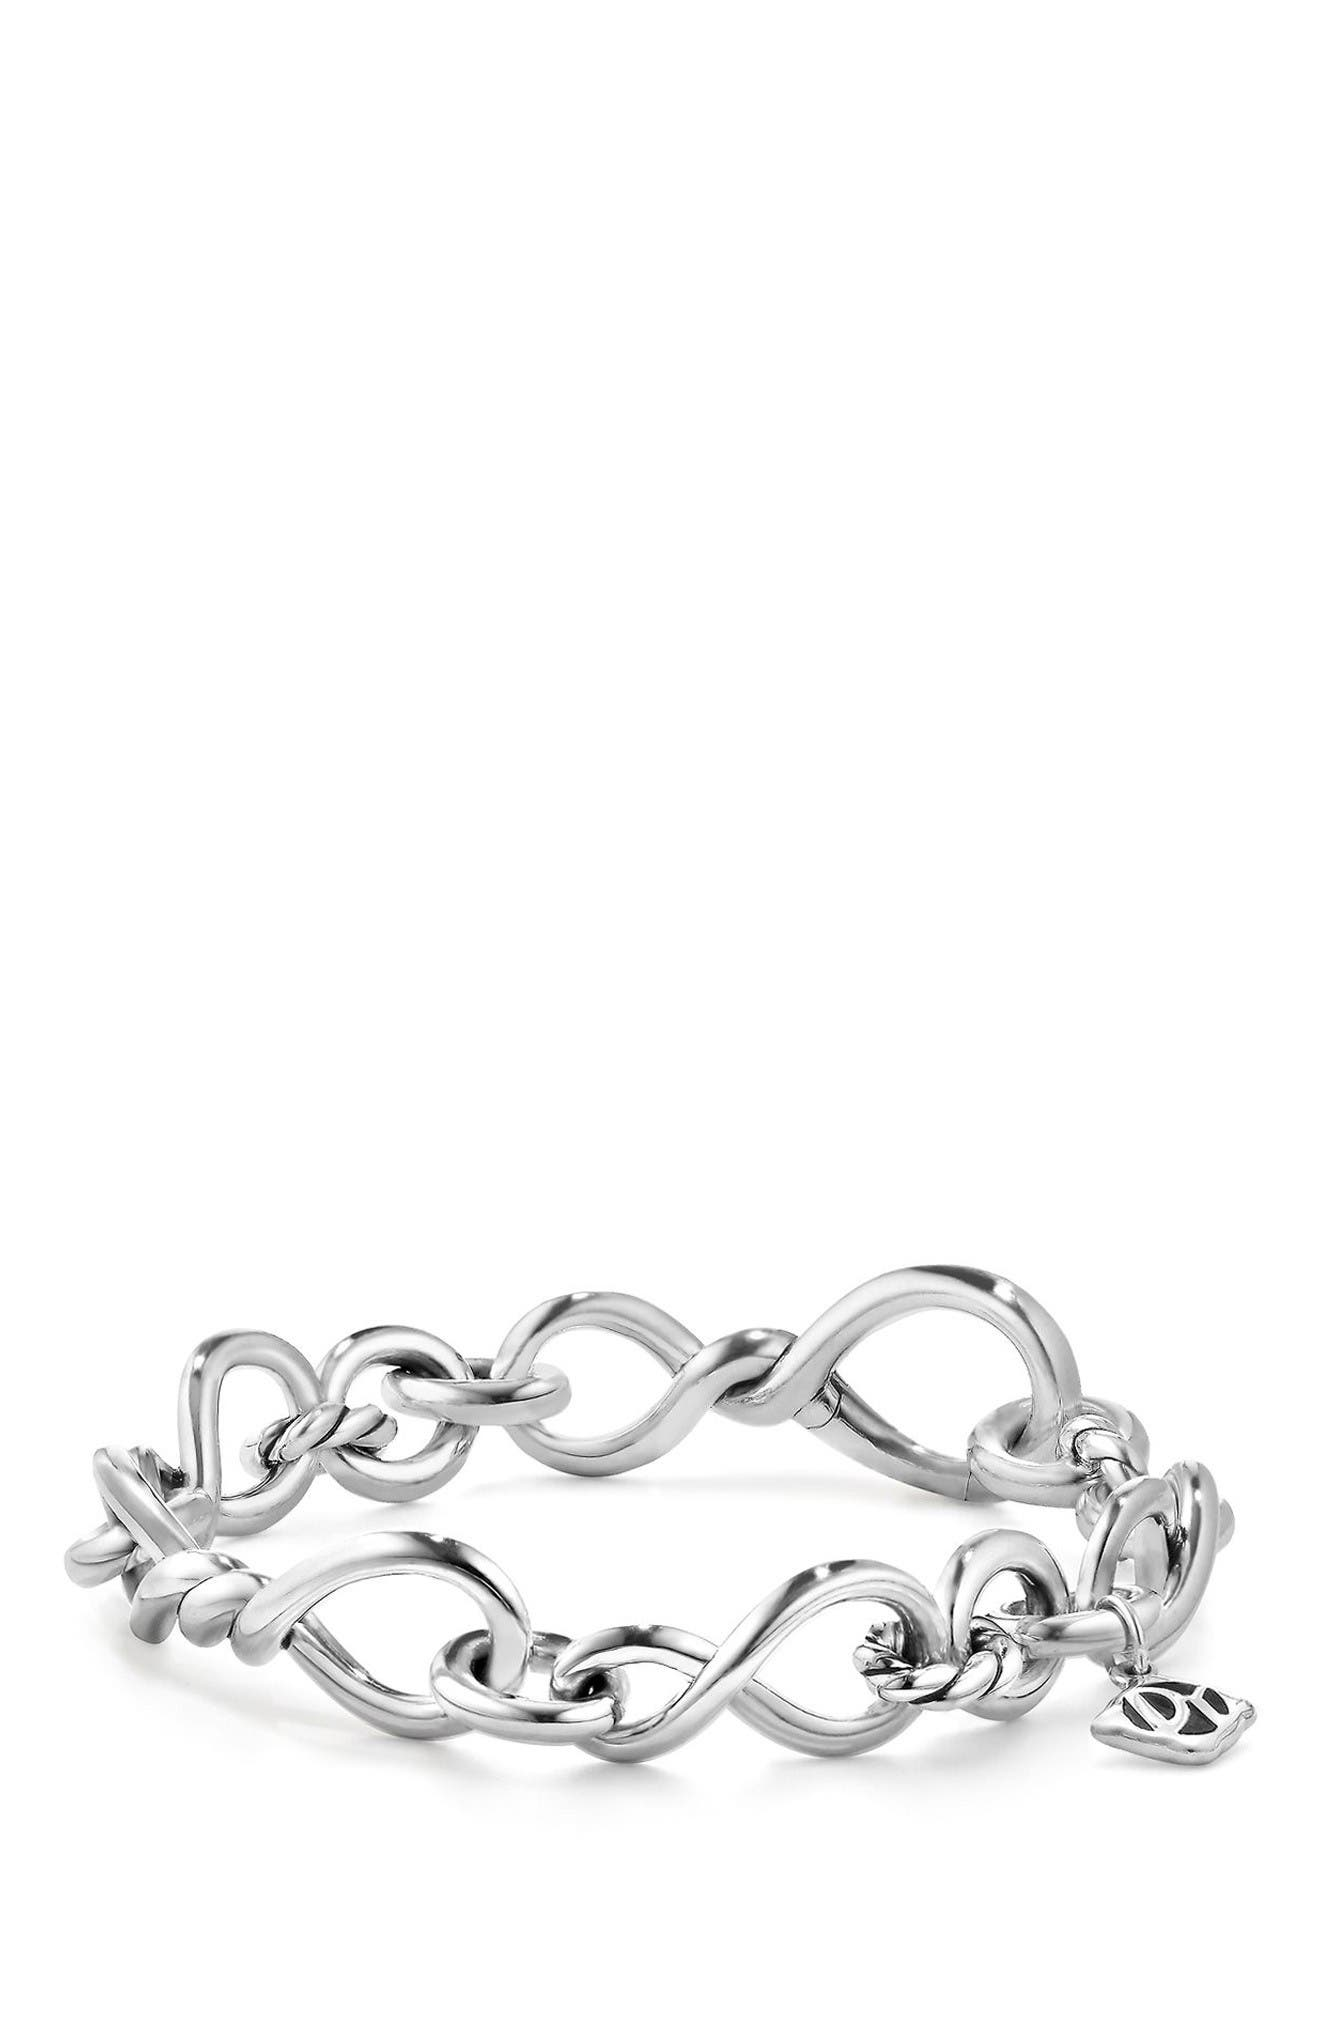 Alternate Image 1 Selected - David Yurman Continuance Medium Chain Bracelet